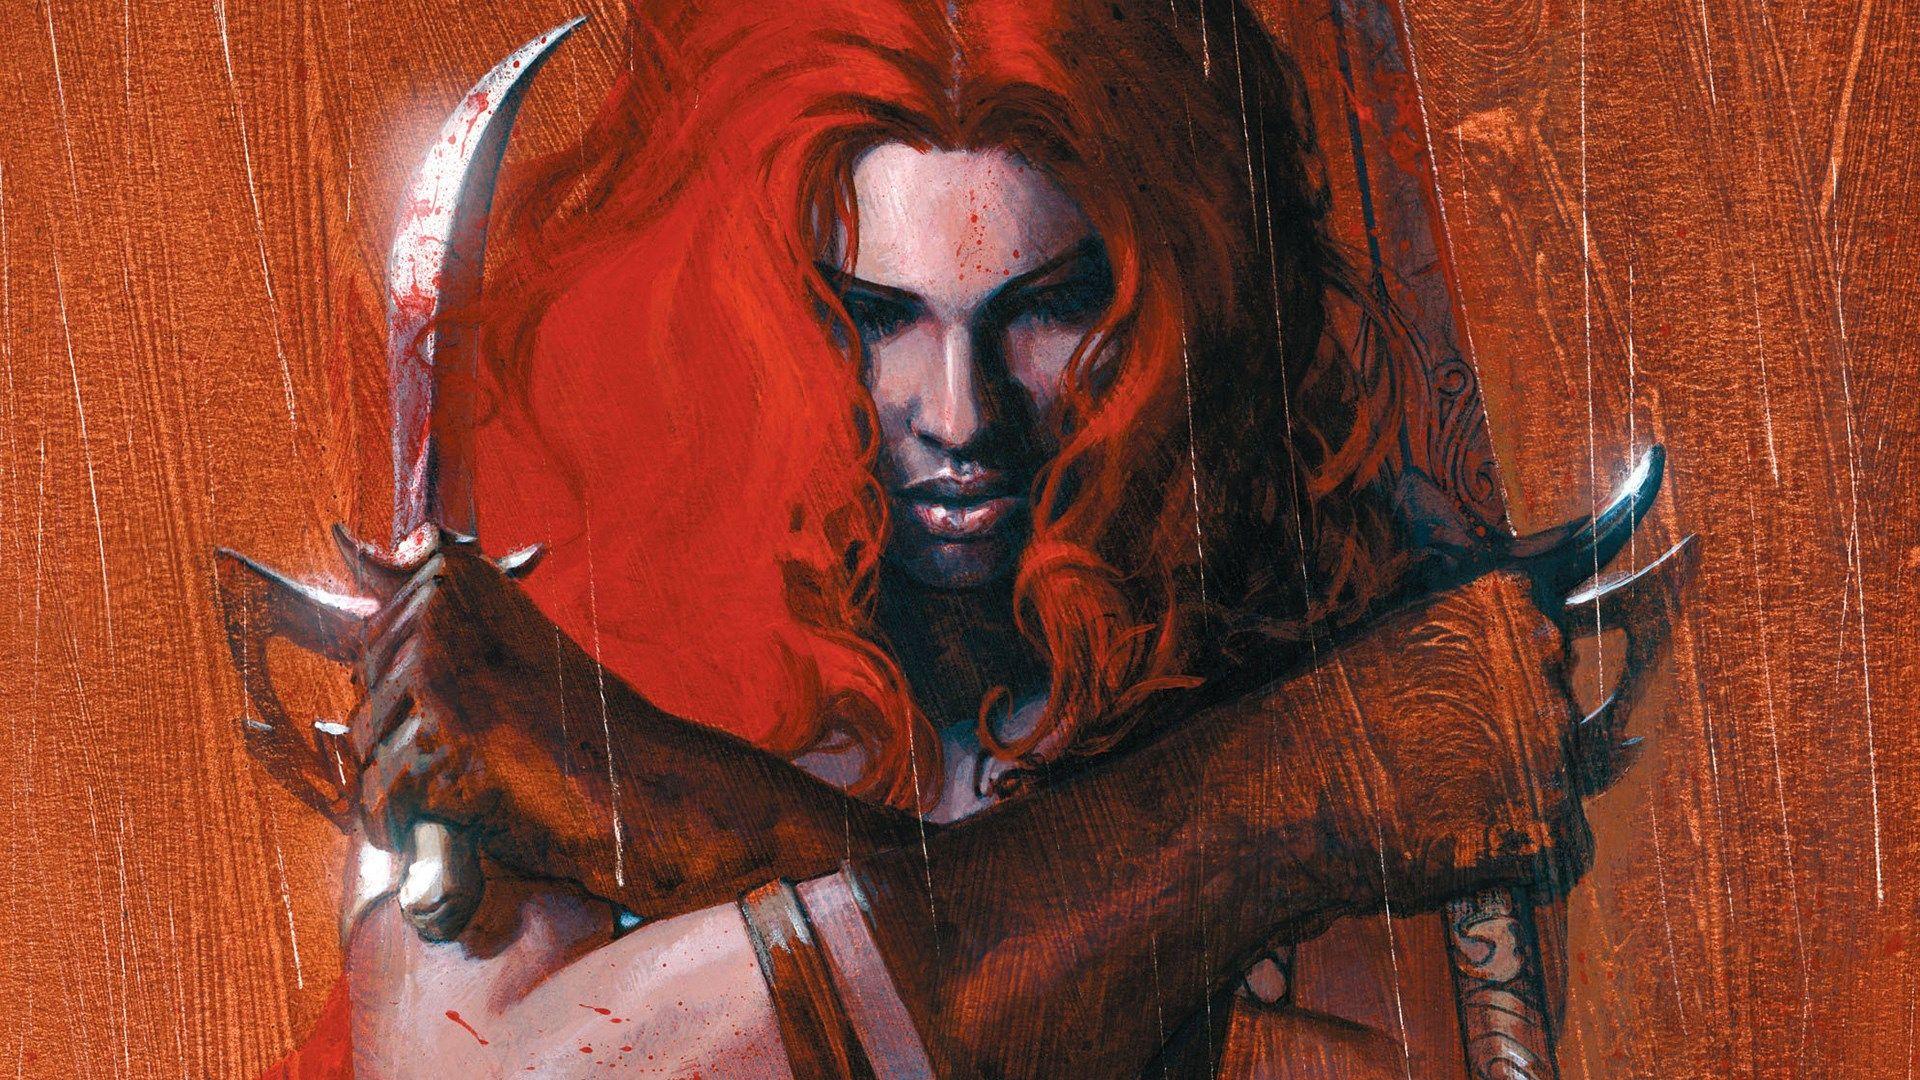 Red Sonja 1080p Windows Red Sonja Fantasy Portraits Sword And Sorcery